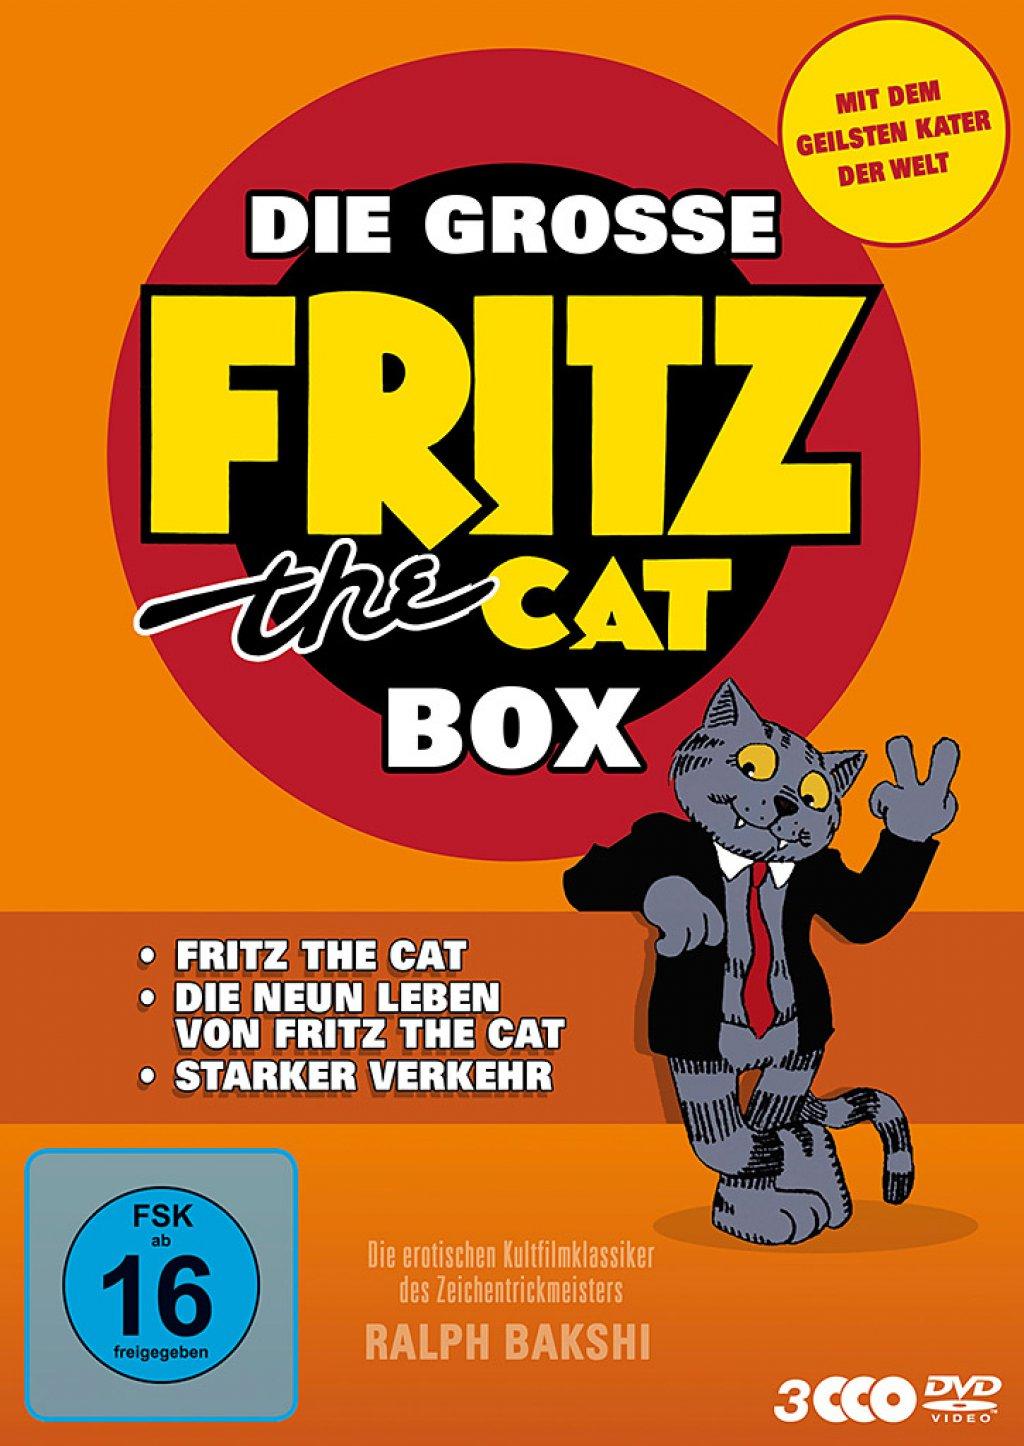 Die grosse Fritz the Cat Box (DVD)